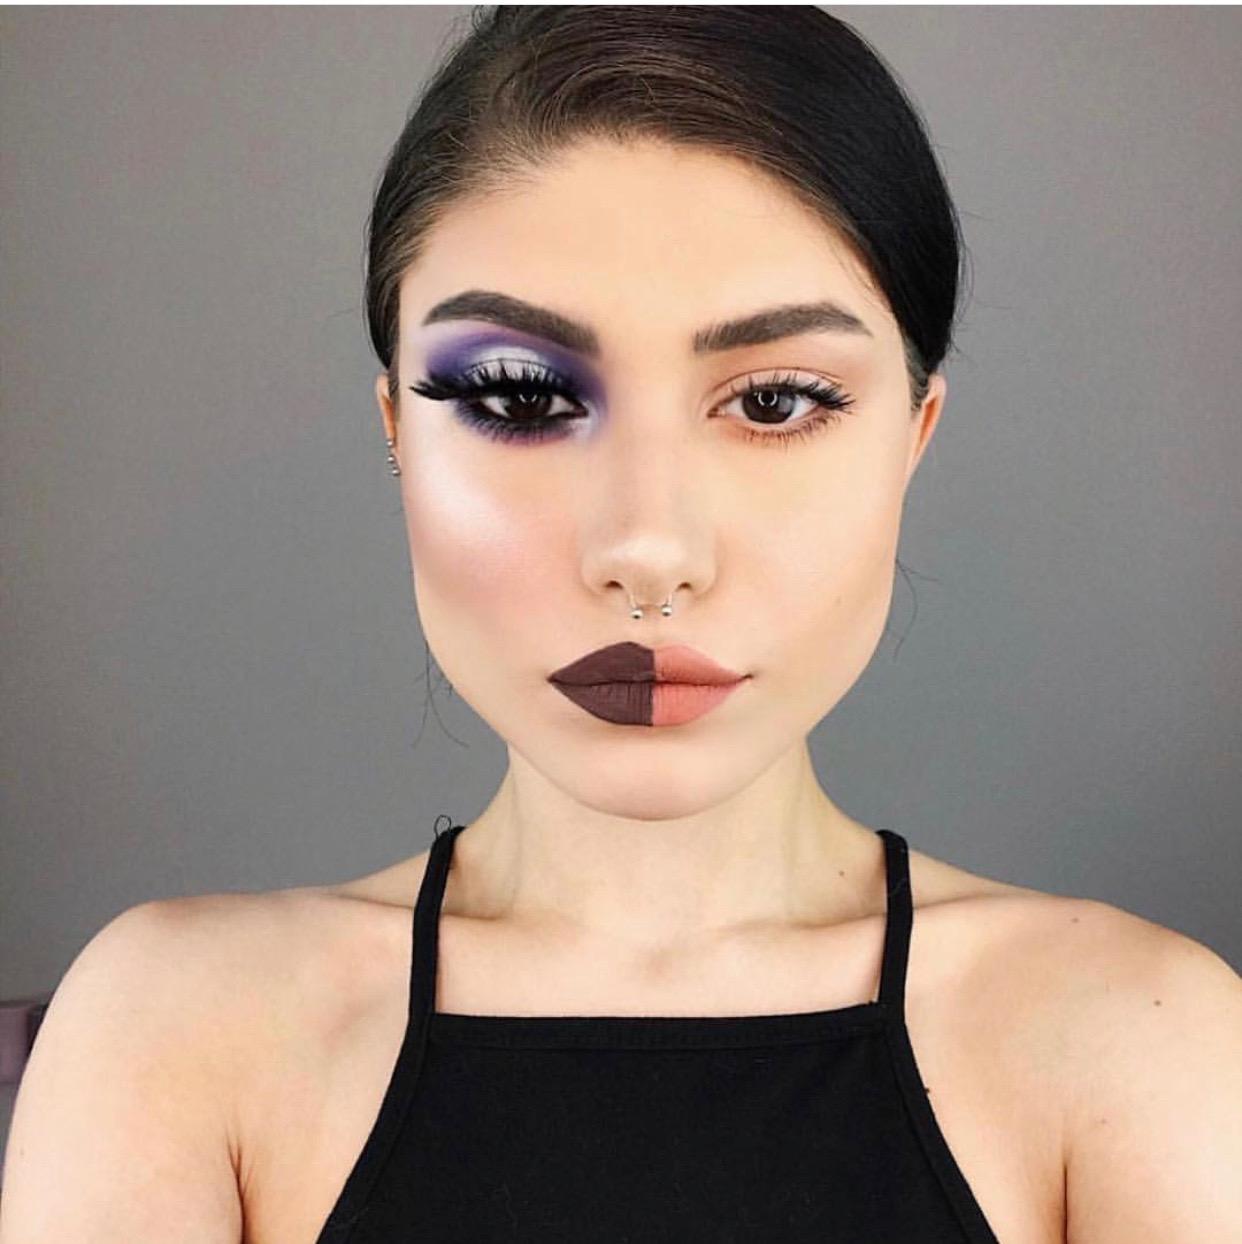 half-and-half makeup transformations